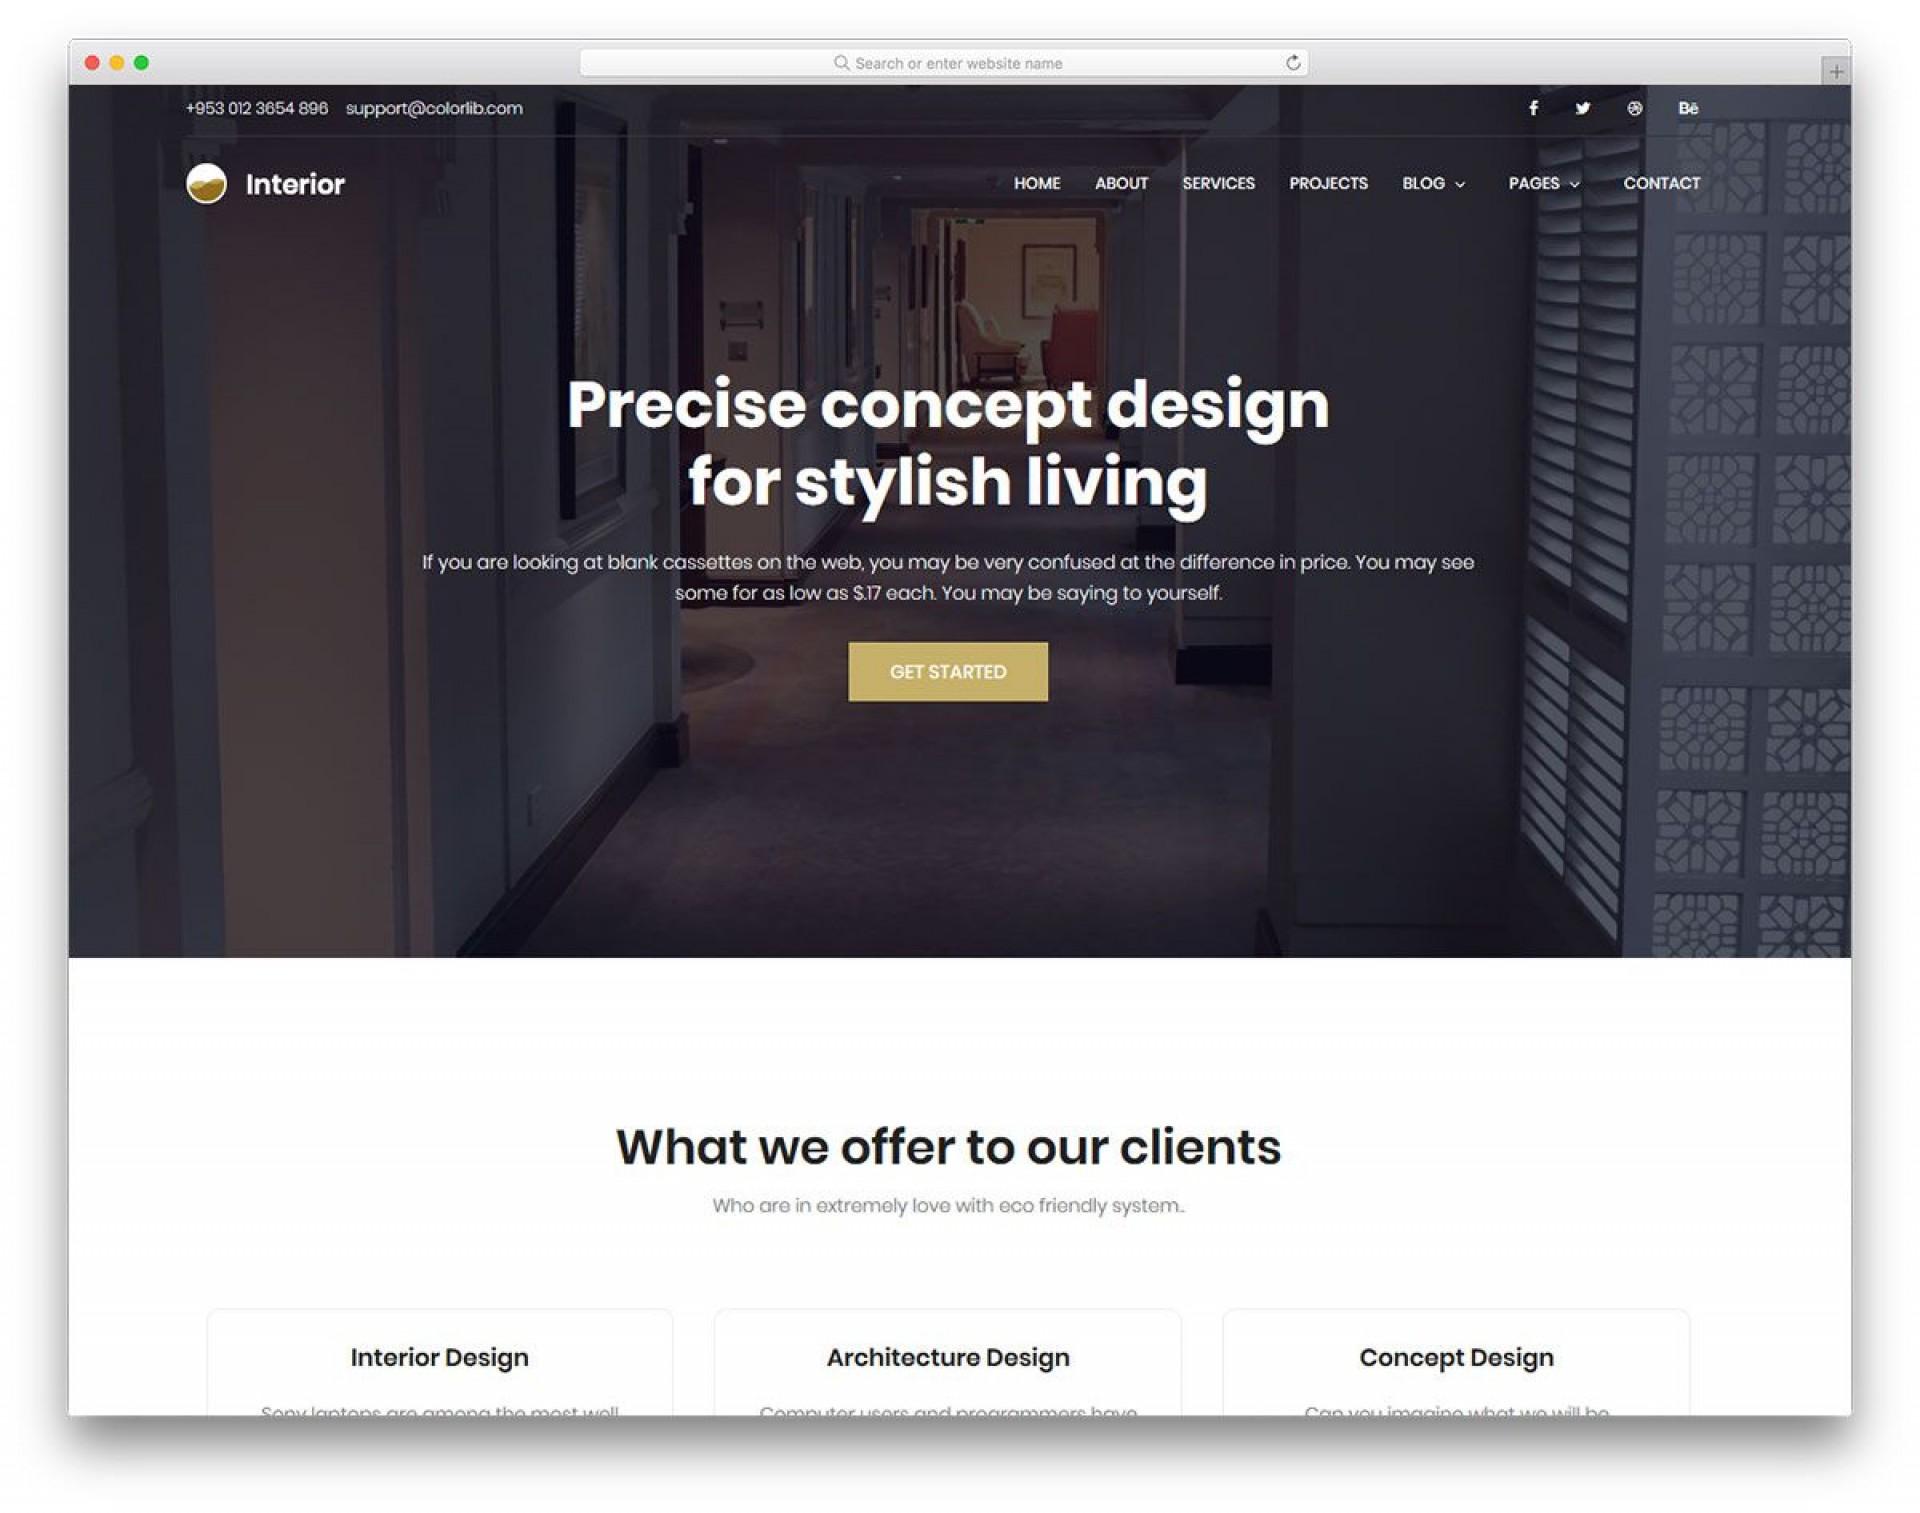 005 Impressive Interior Design Website Template High Def  Templates Company Free Download Html1920